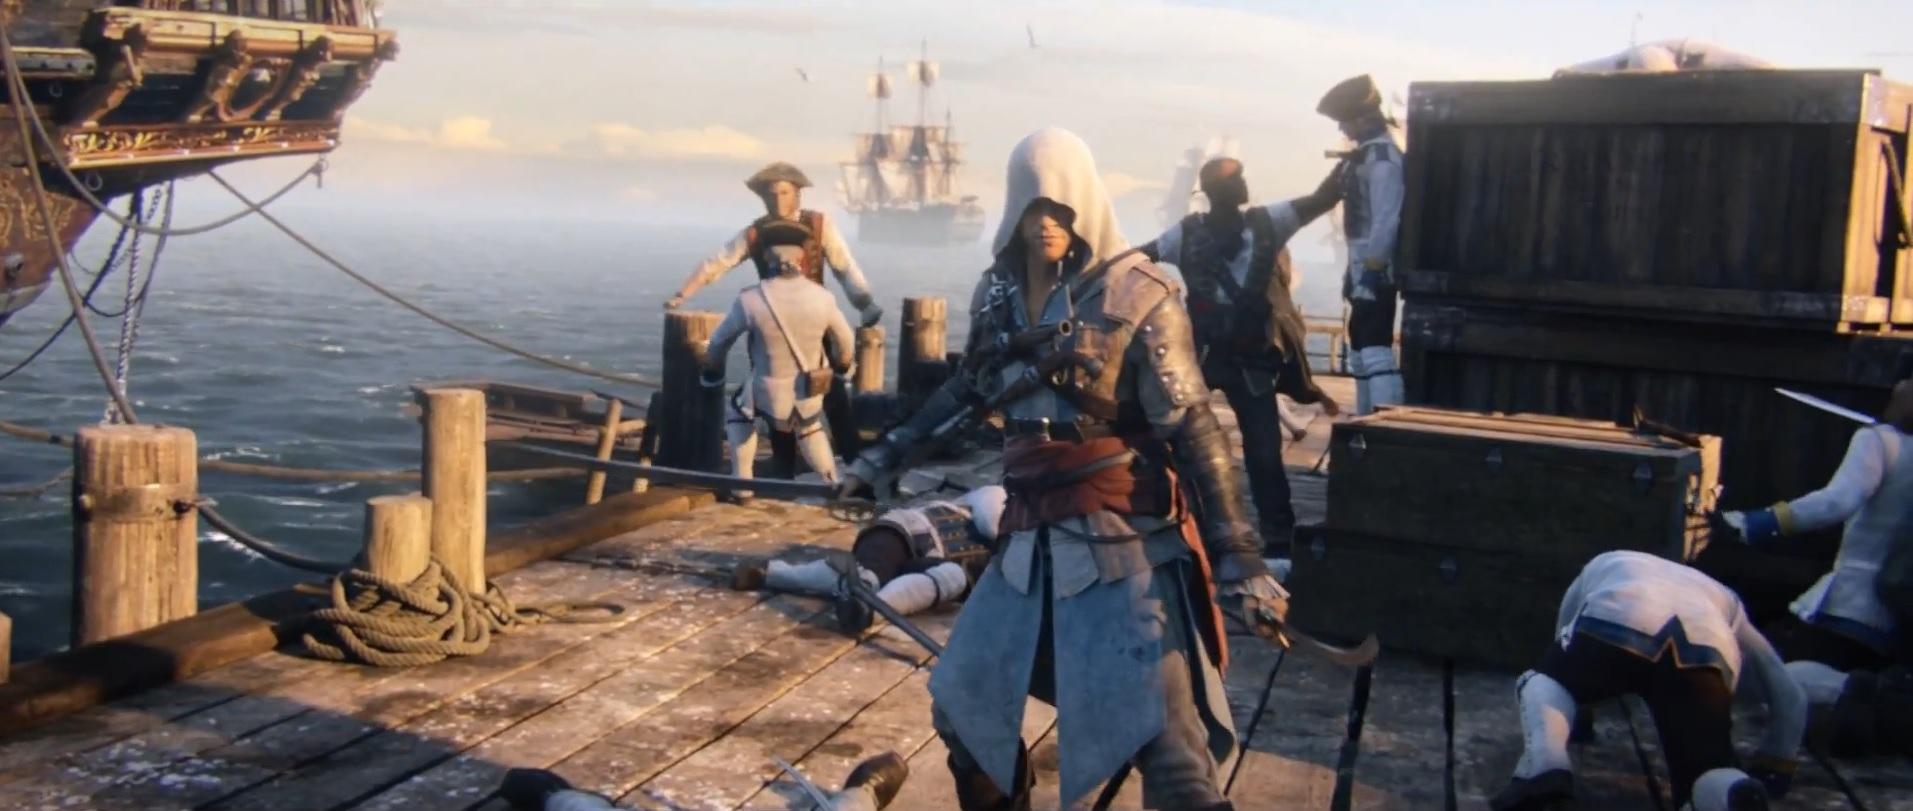 Assassins Creed IV Black Flag wallpaper 8